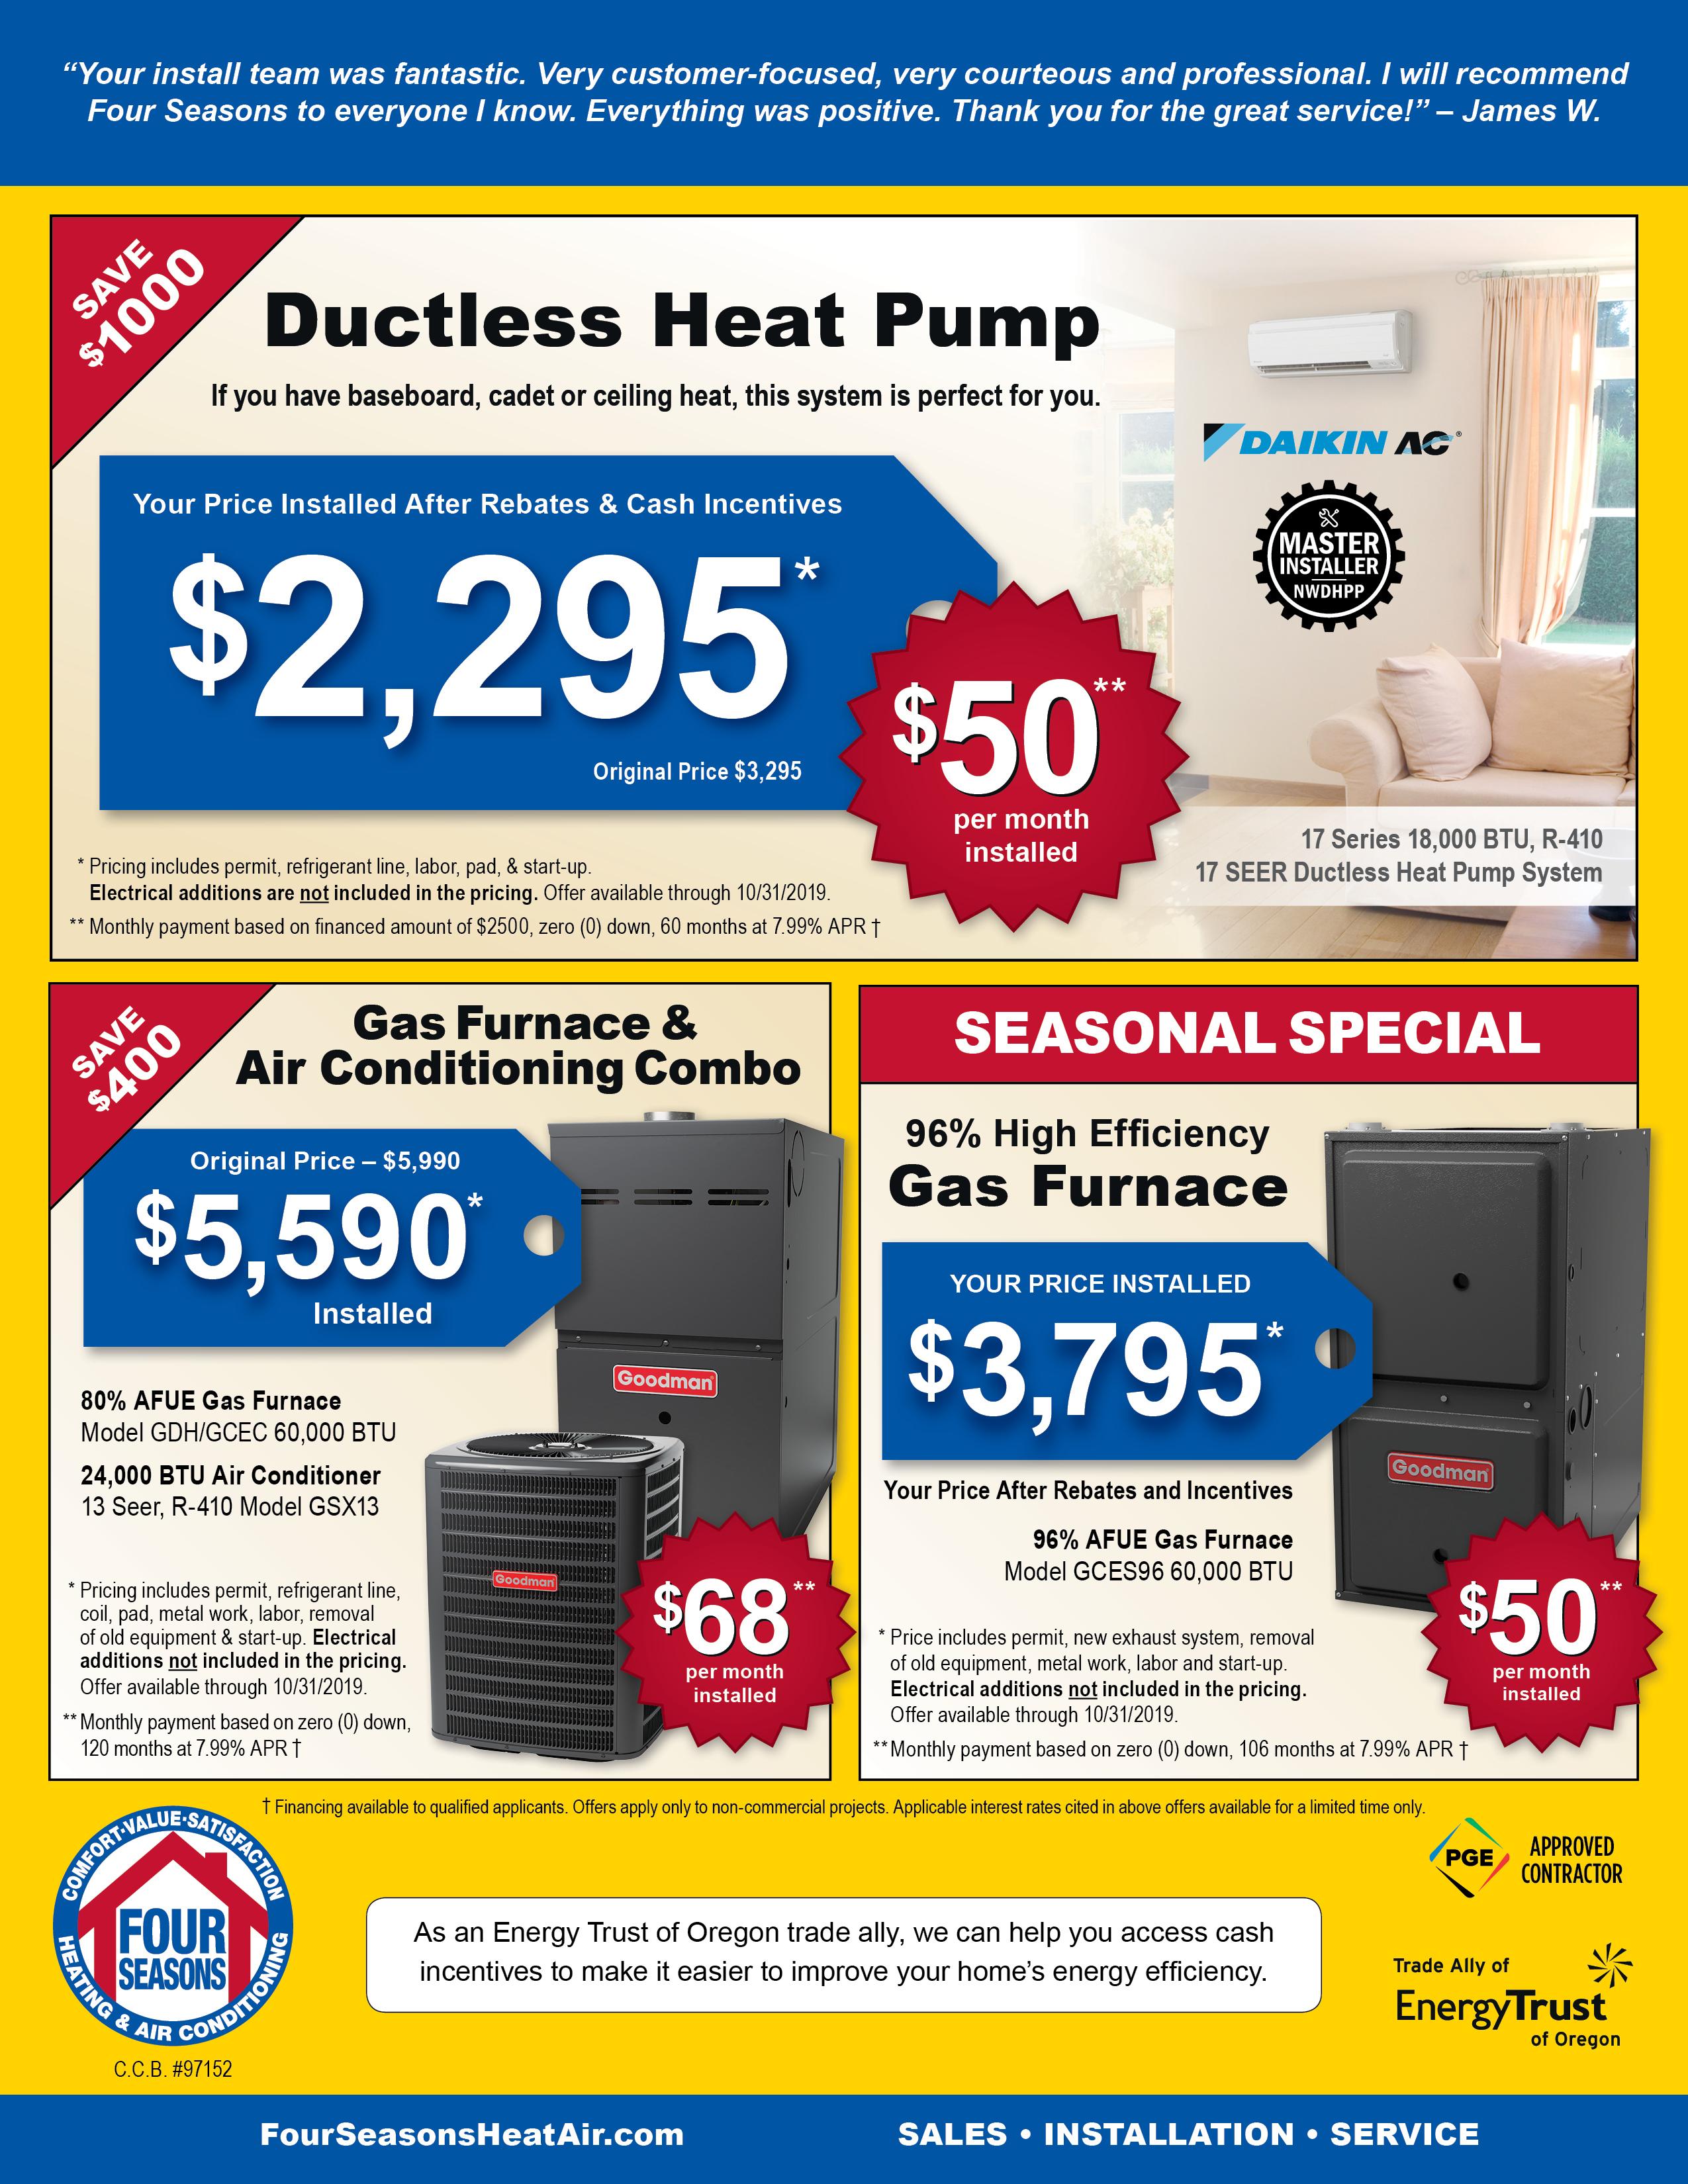 Four Seasons Heating & Air Conditioning Seasonal Specials